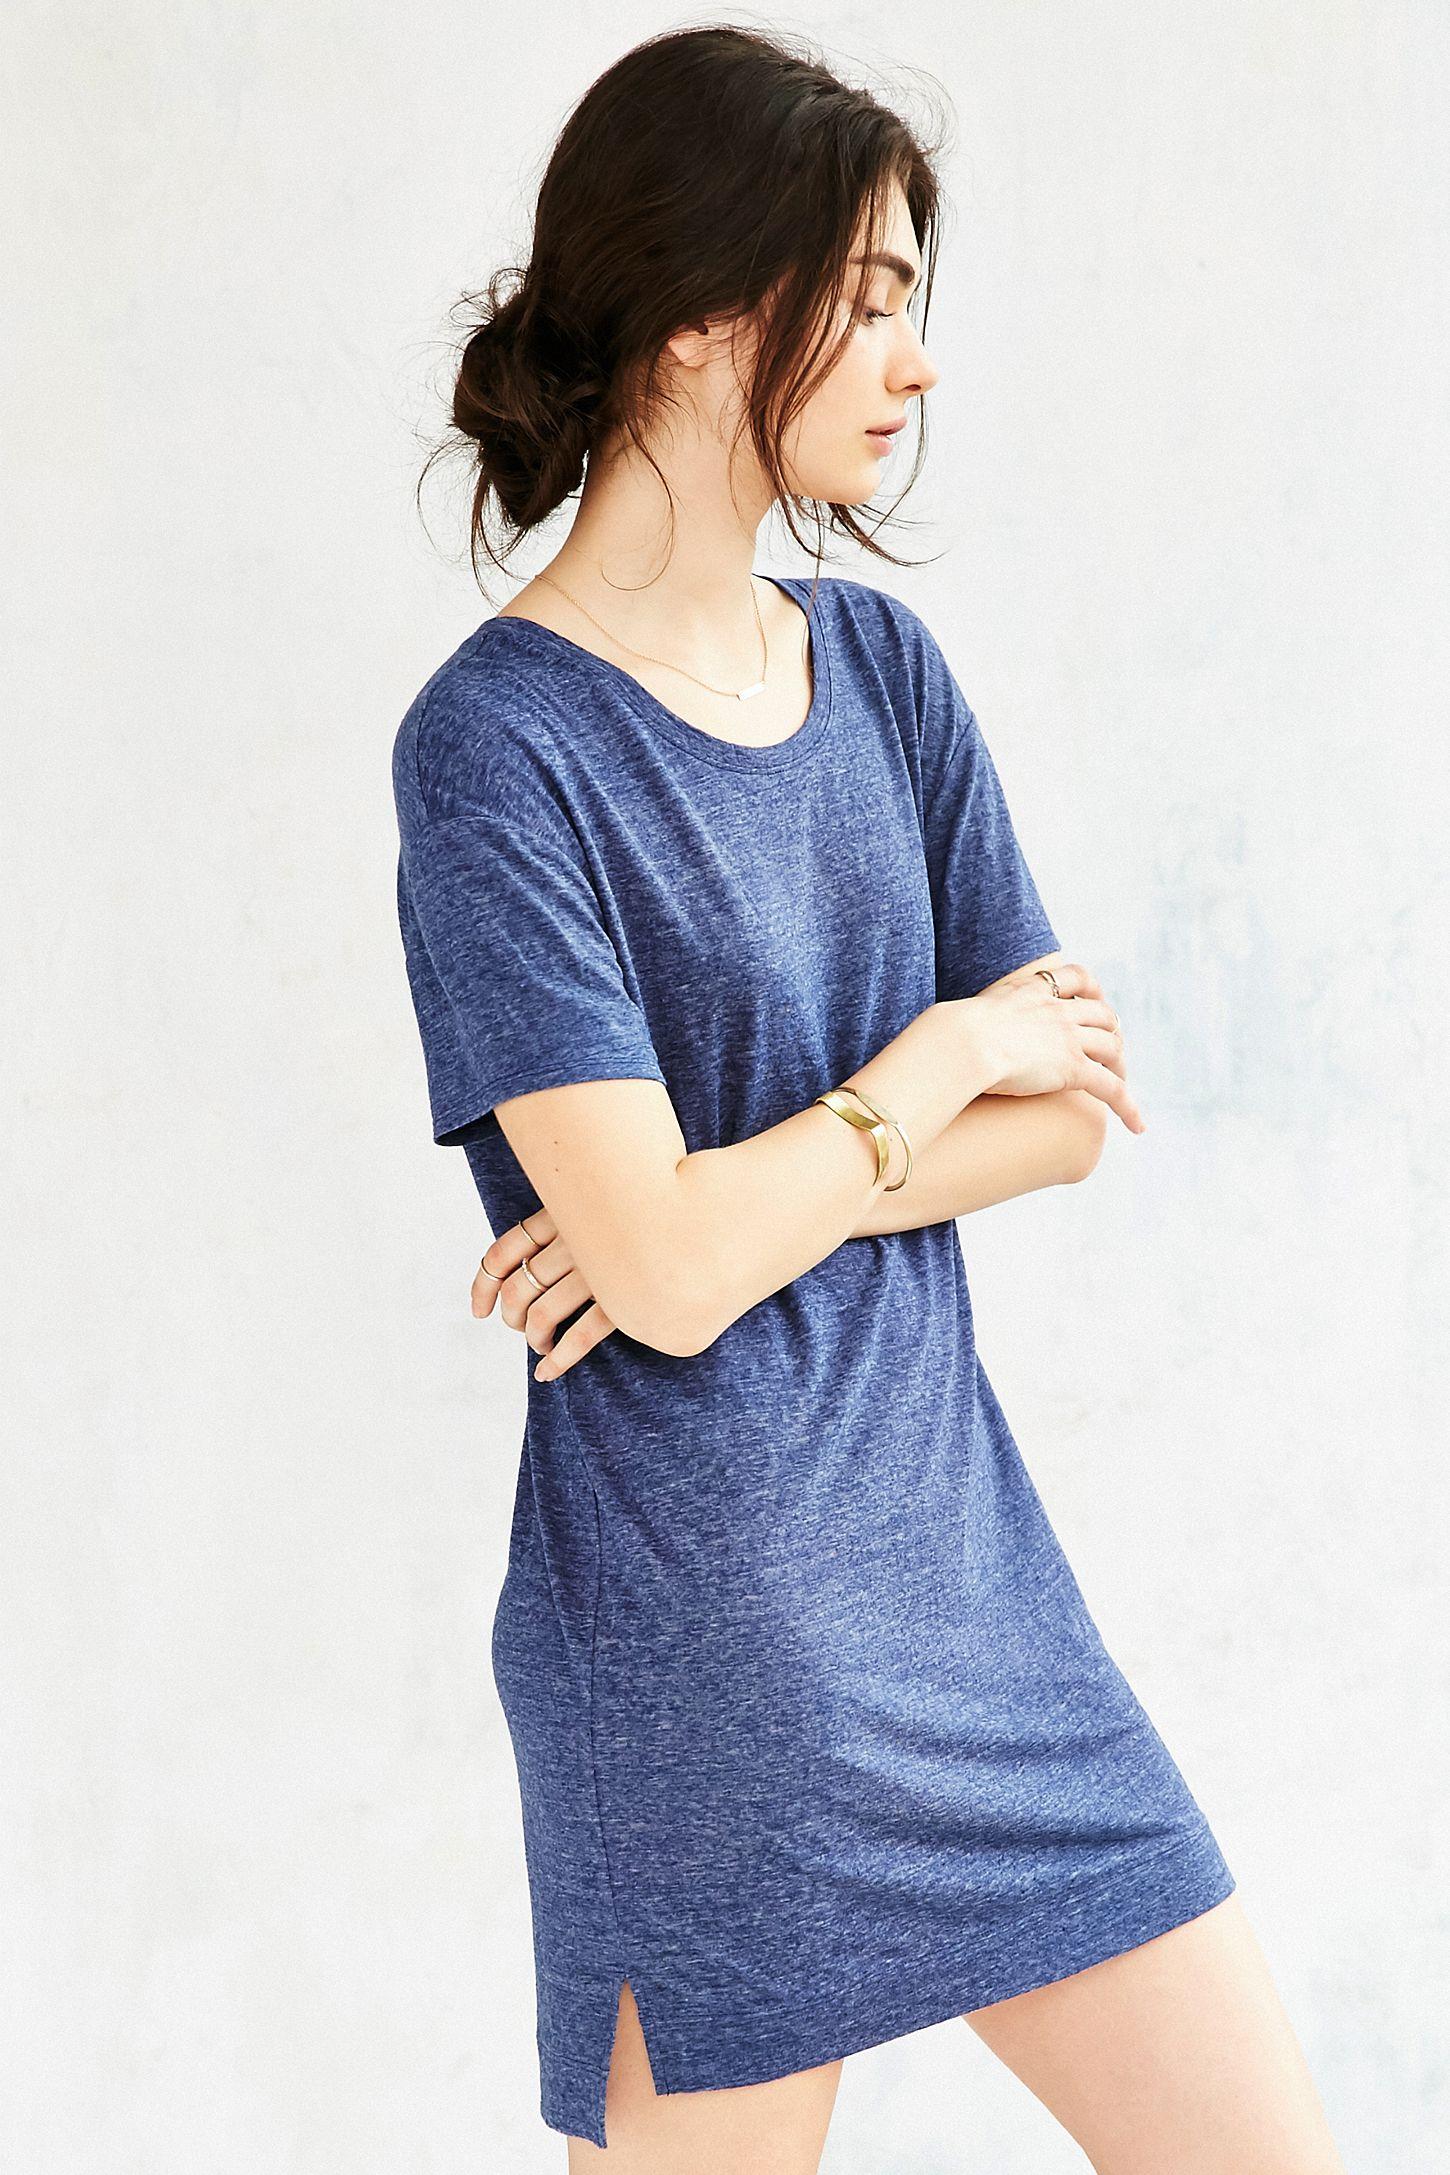 Bdg Estelle Boyfriend T Shirt Dress Urban Outfitters